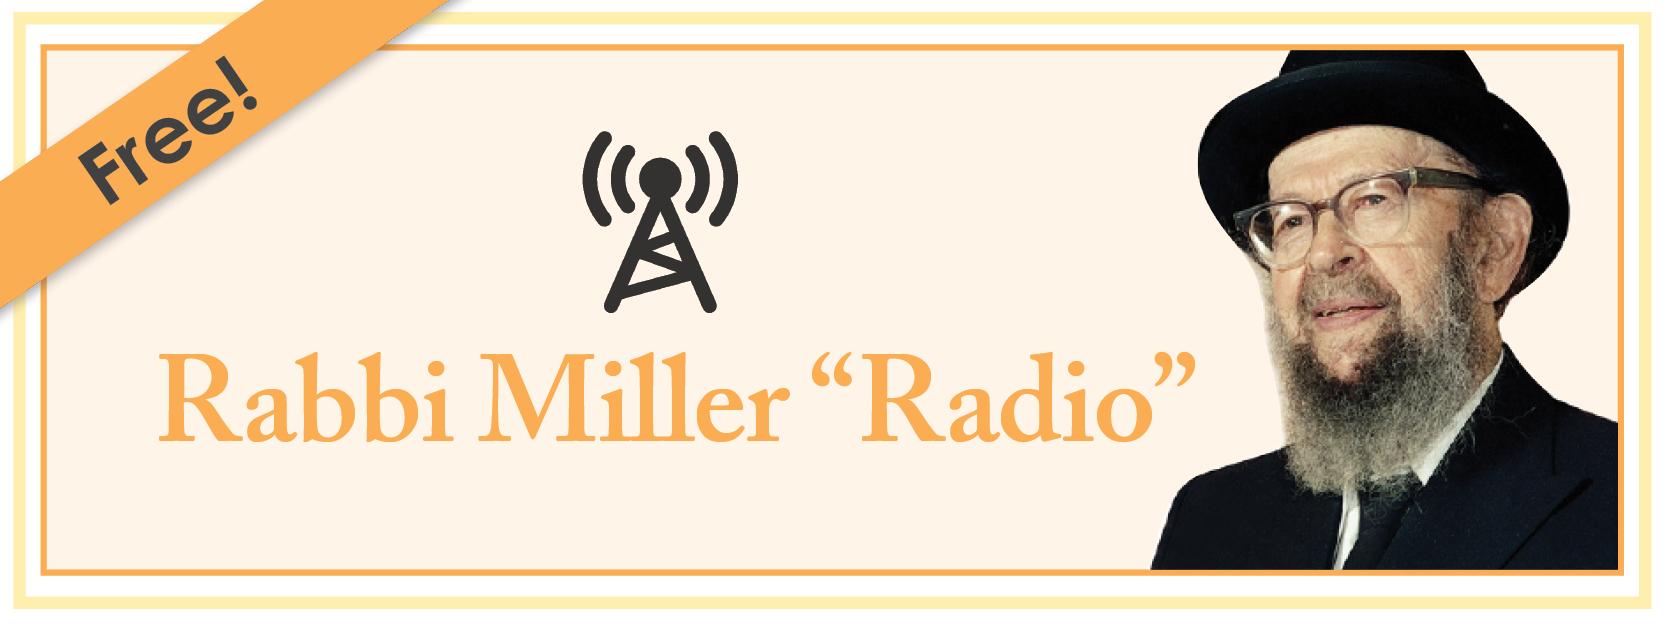 shp-banners-radio.jpg